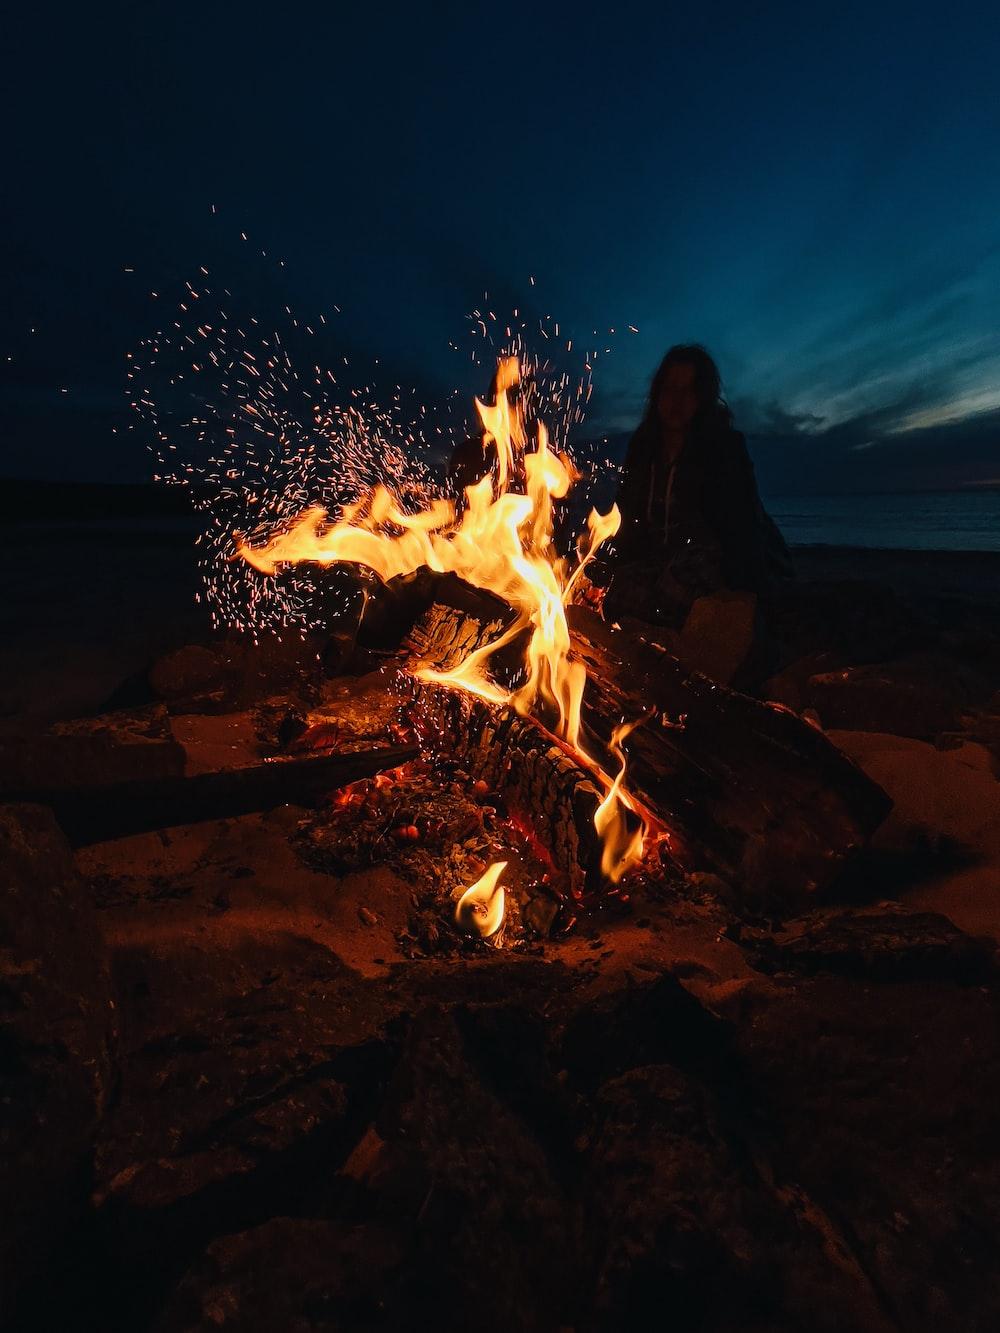 man in black jacket standing near bonfire during night time